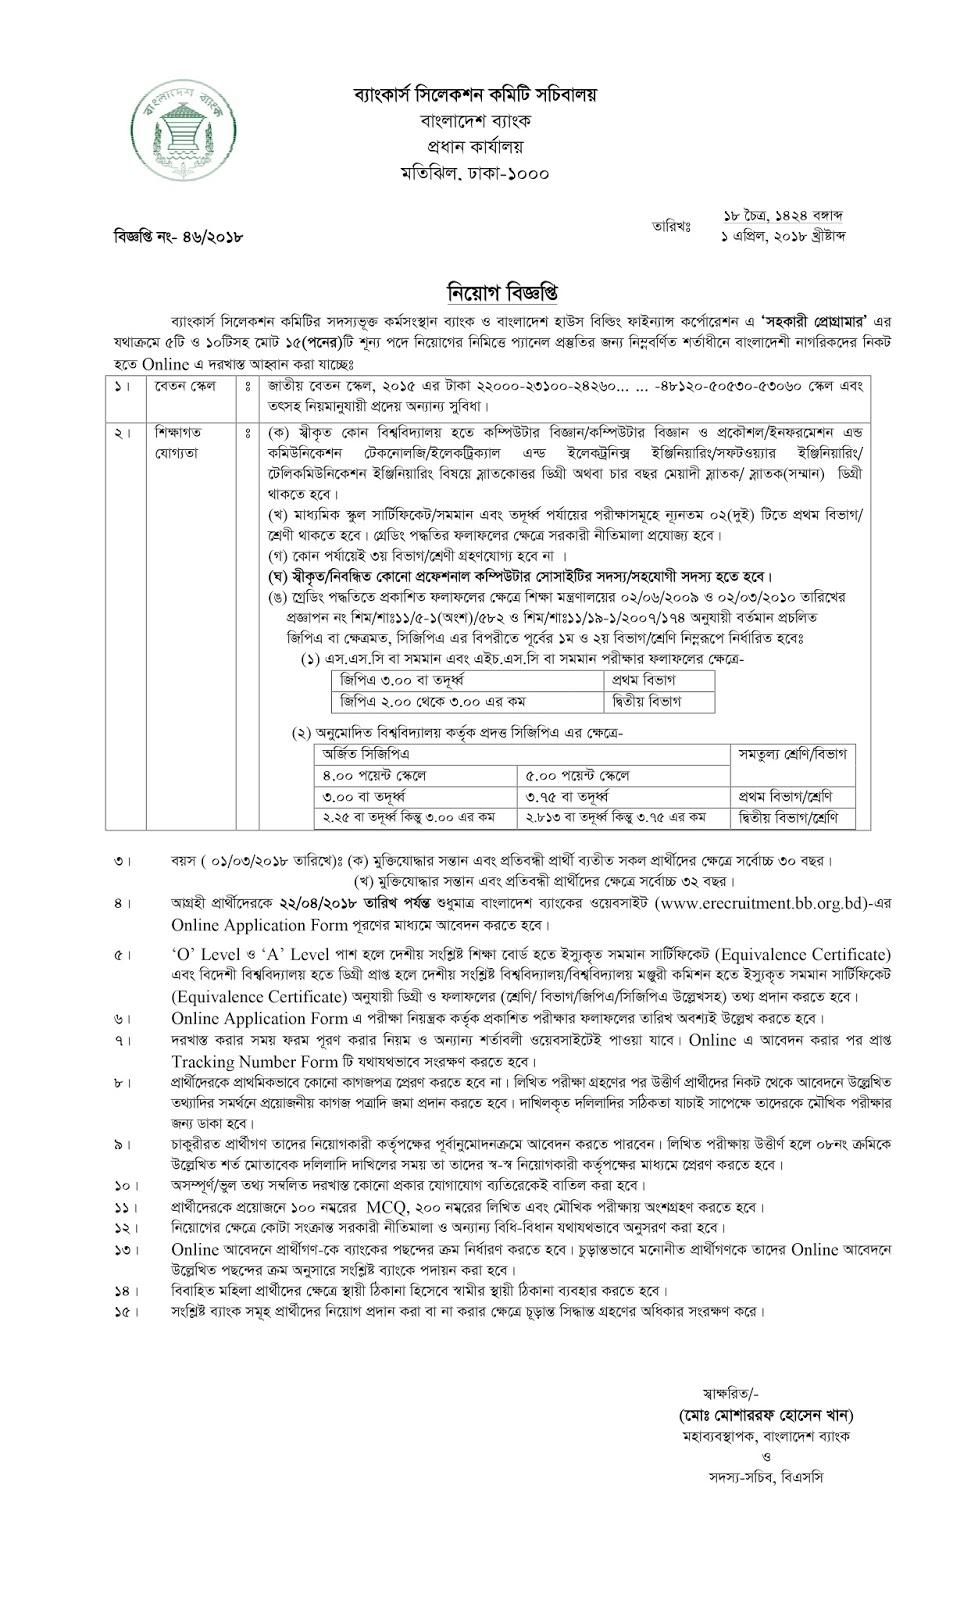 Karmasangsthan Bank and Bangladesh House Building Finance Corporation(BHBFC) Assistant Programmer Job Circular 2018